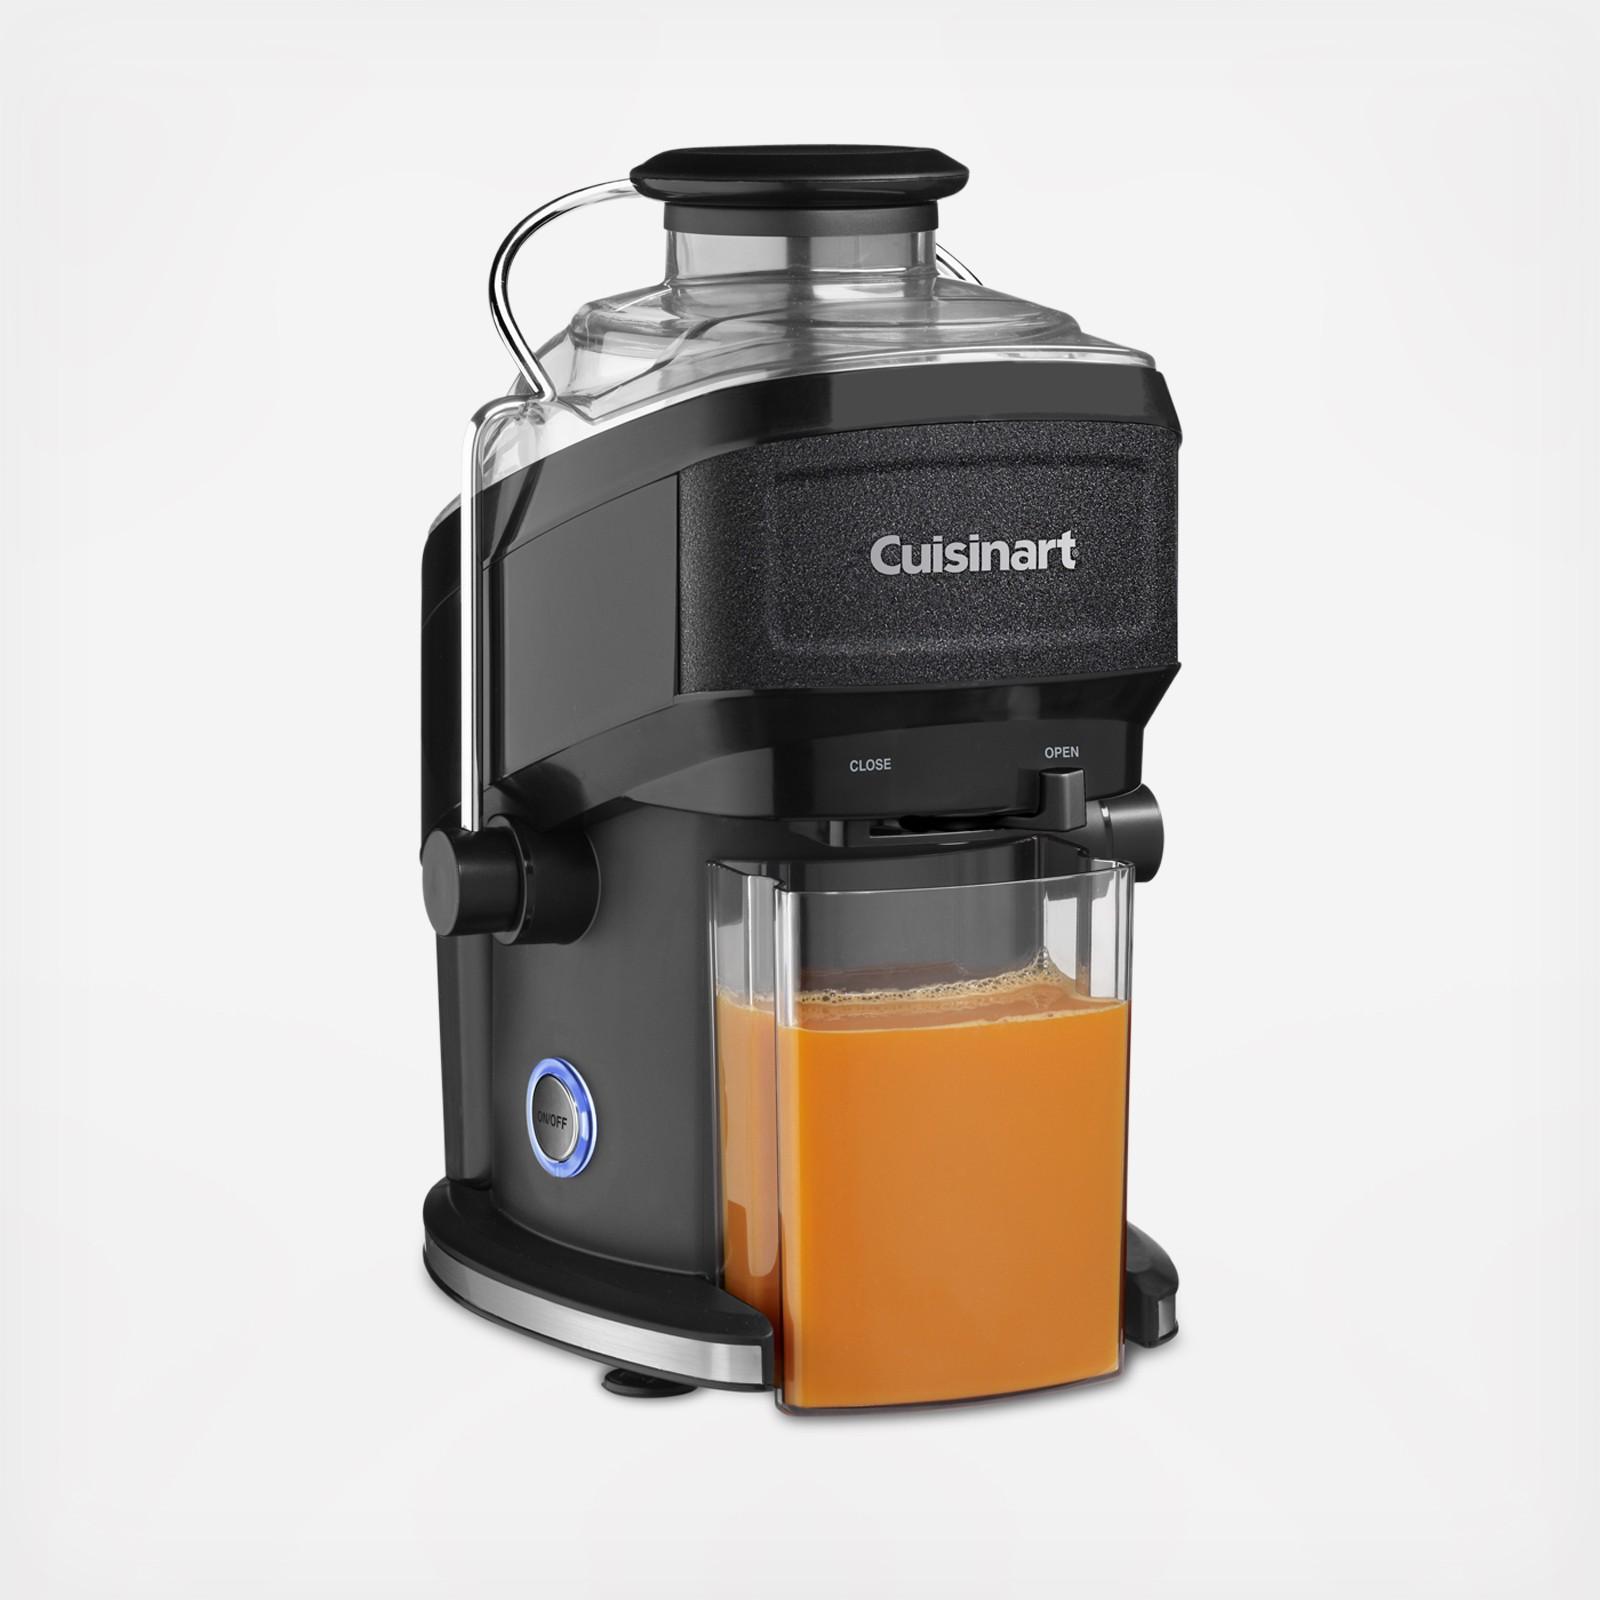 Slow Juicer Cuisinart : Compact Juice Extractor by Cuisinart Wedding Planning, Registry & Gifts